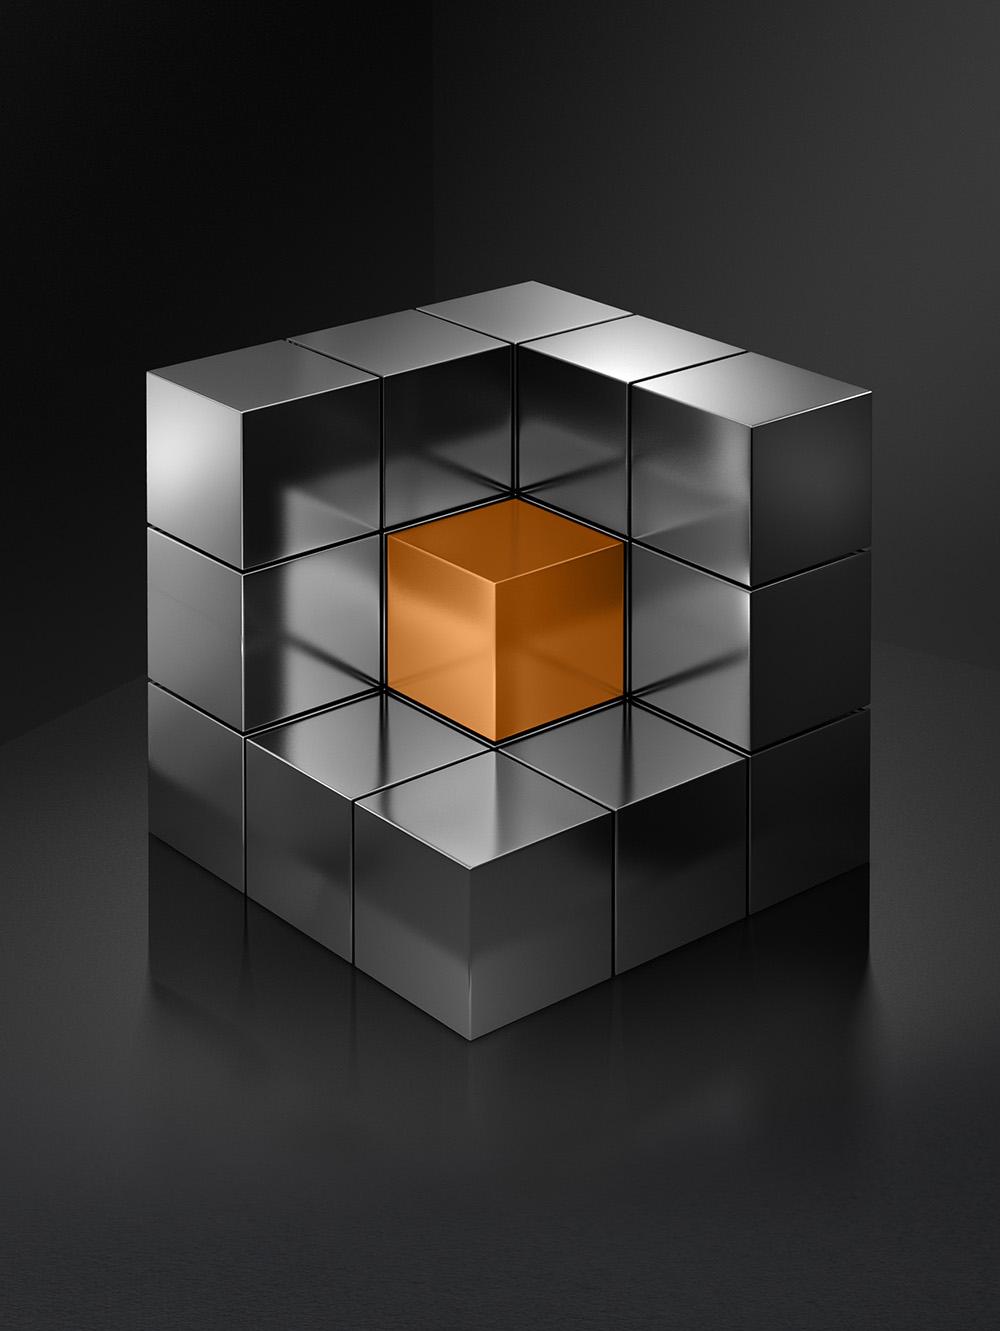 Illustration Cube